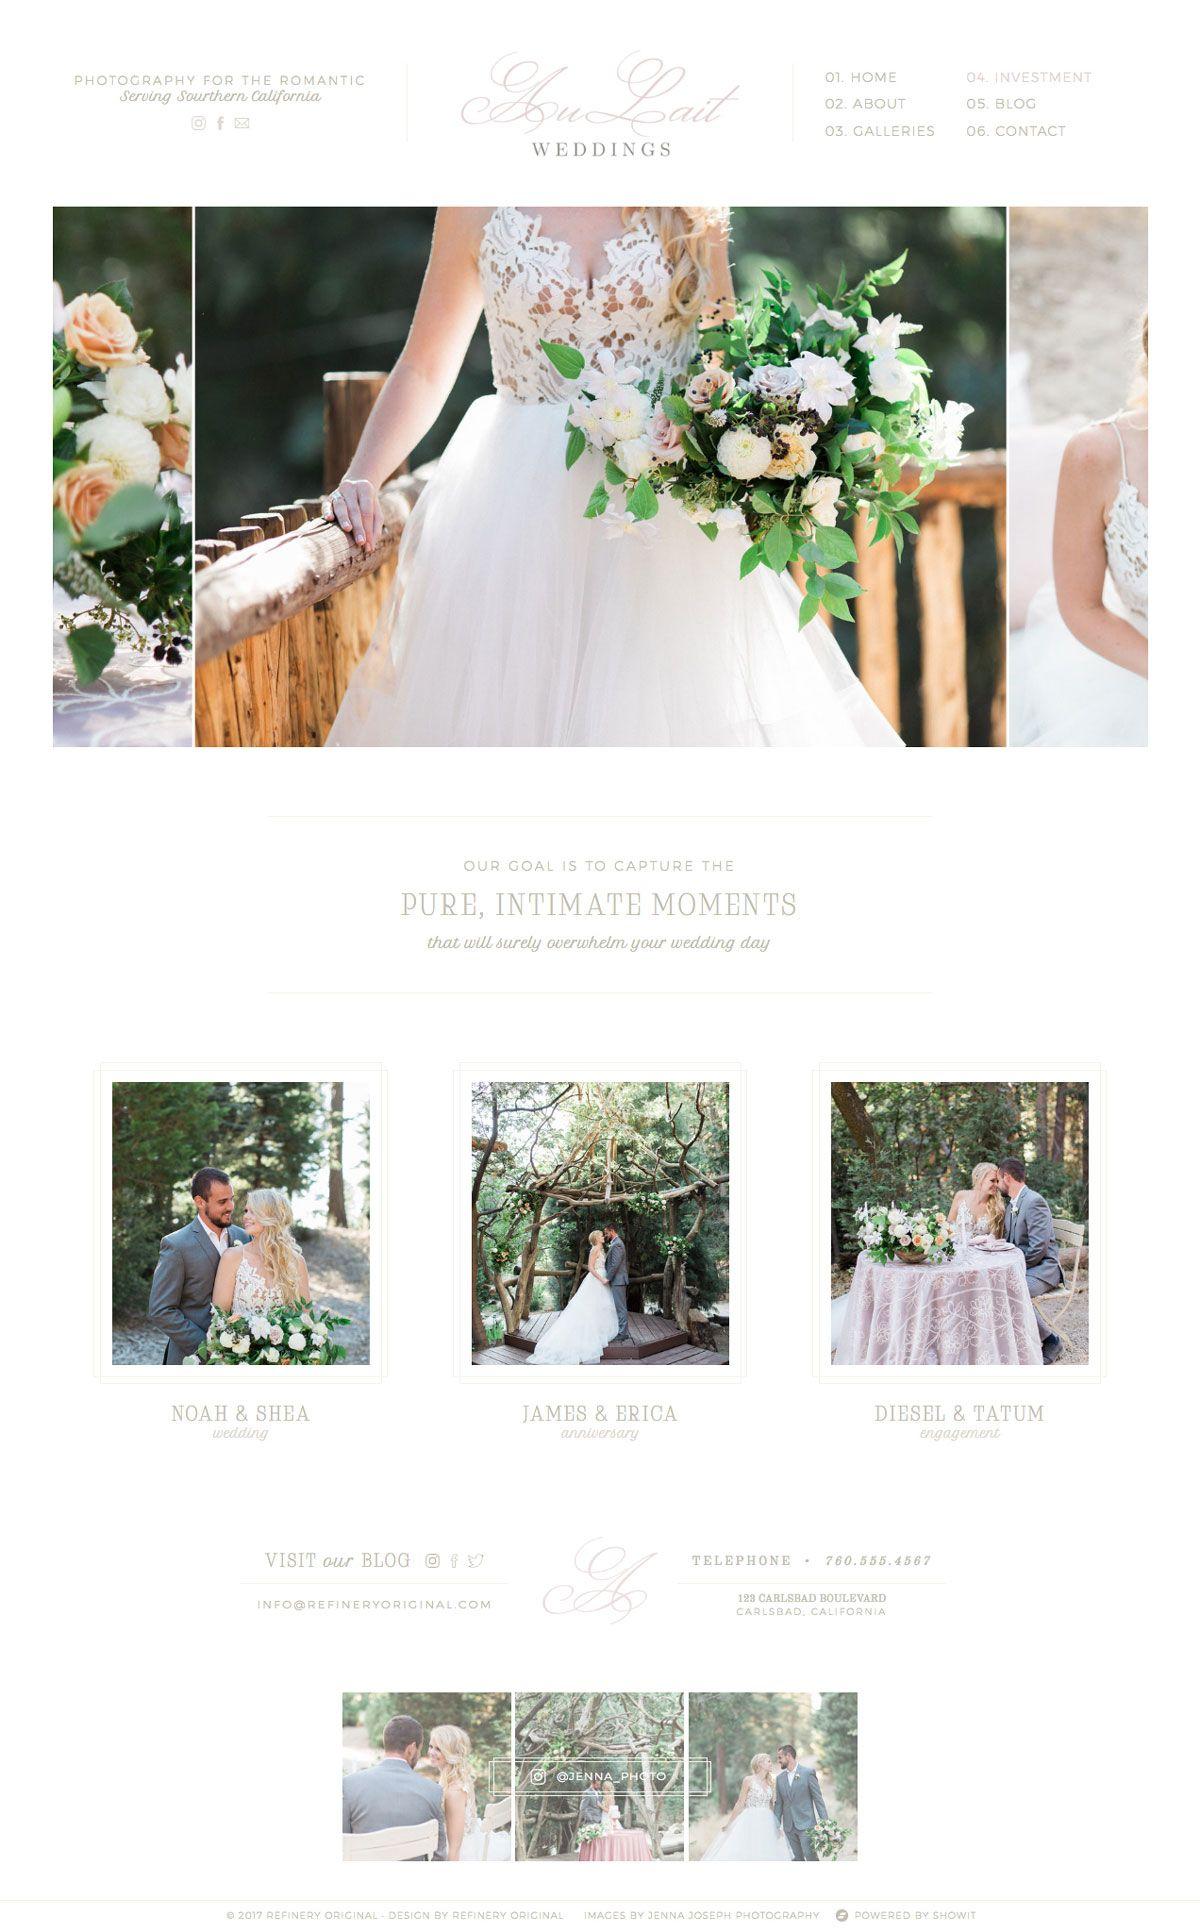 Au Lait Double Shot By Refinery Original Photography Website - Wedding photography website templates